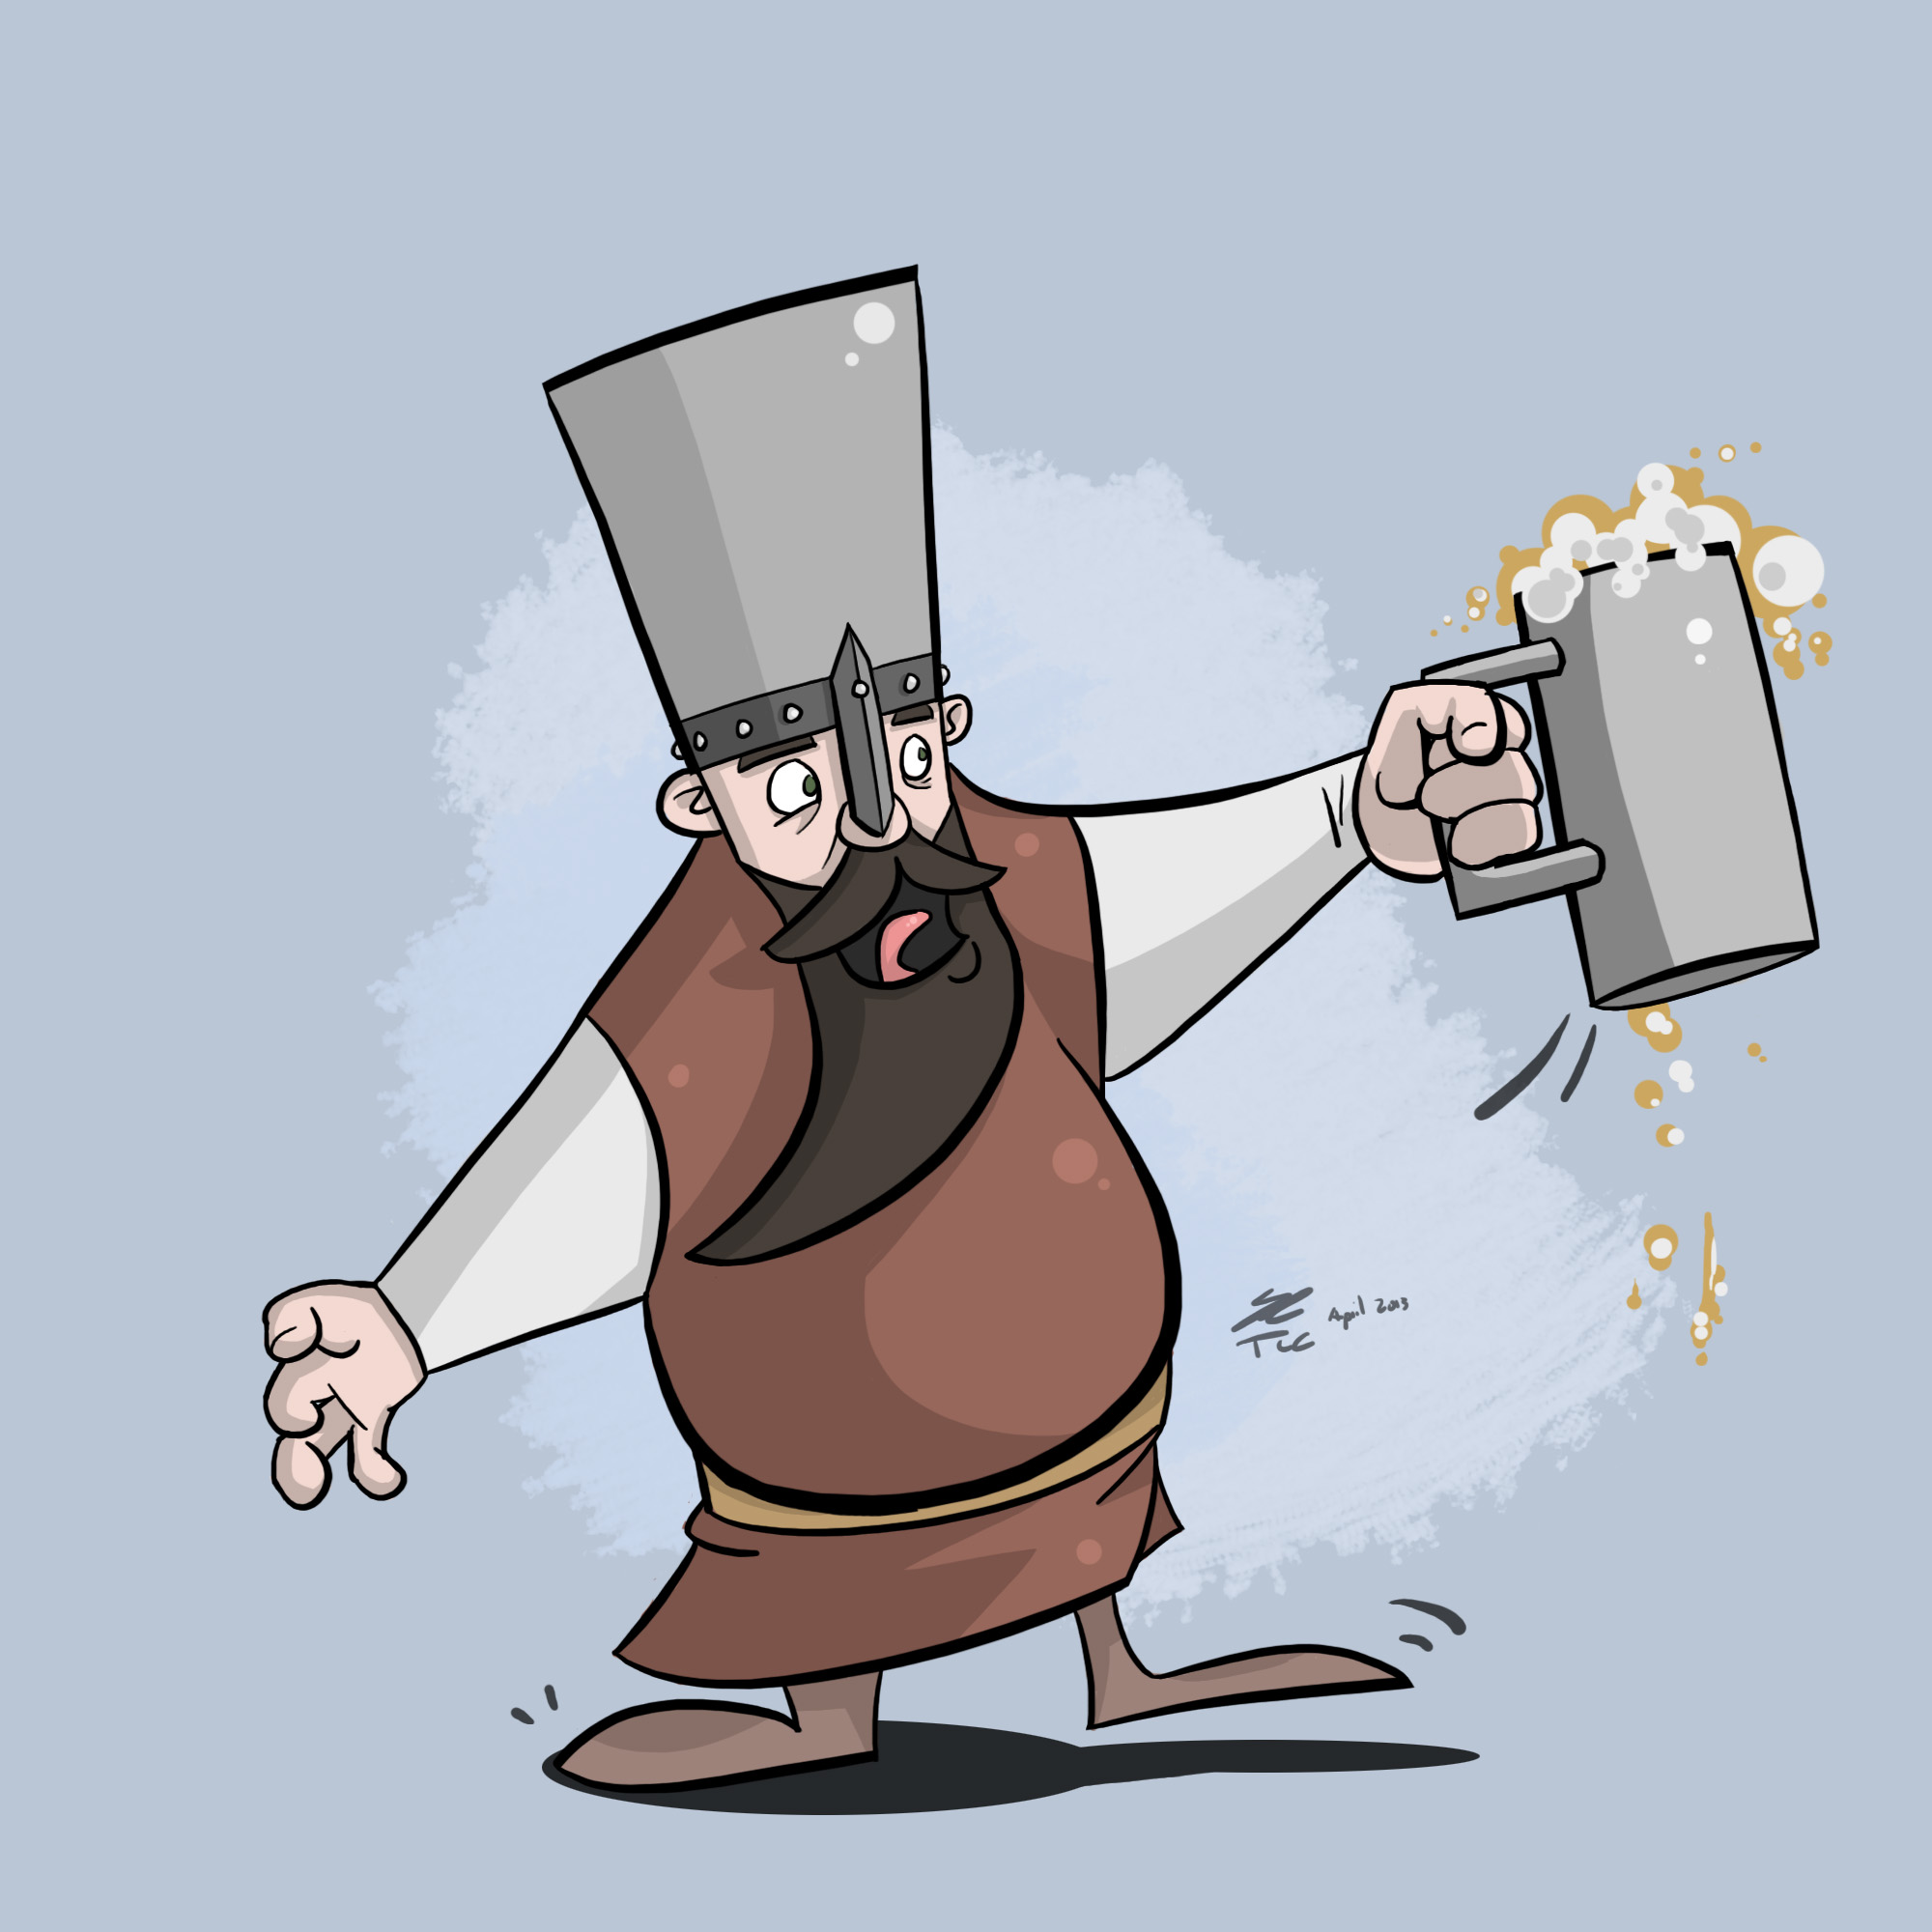 Gautrik the Dwarf